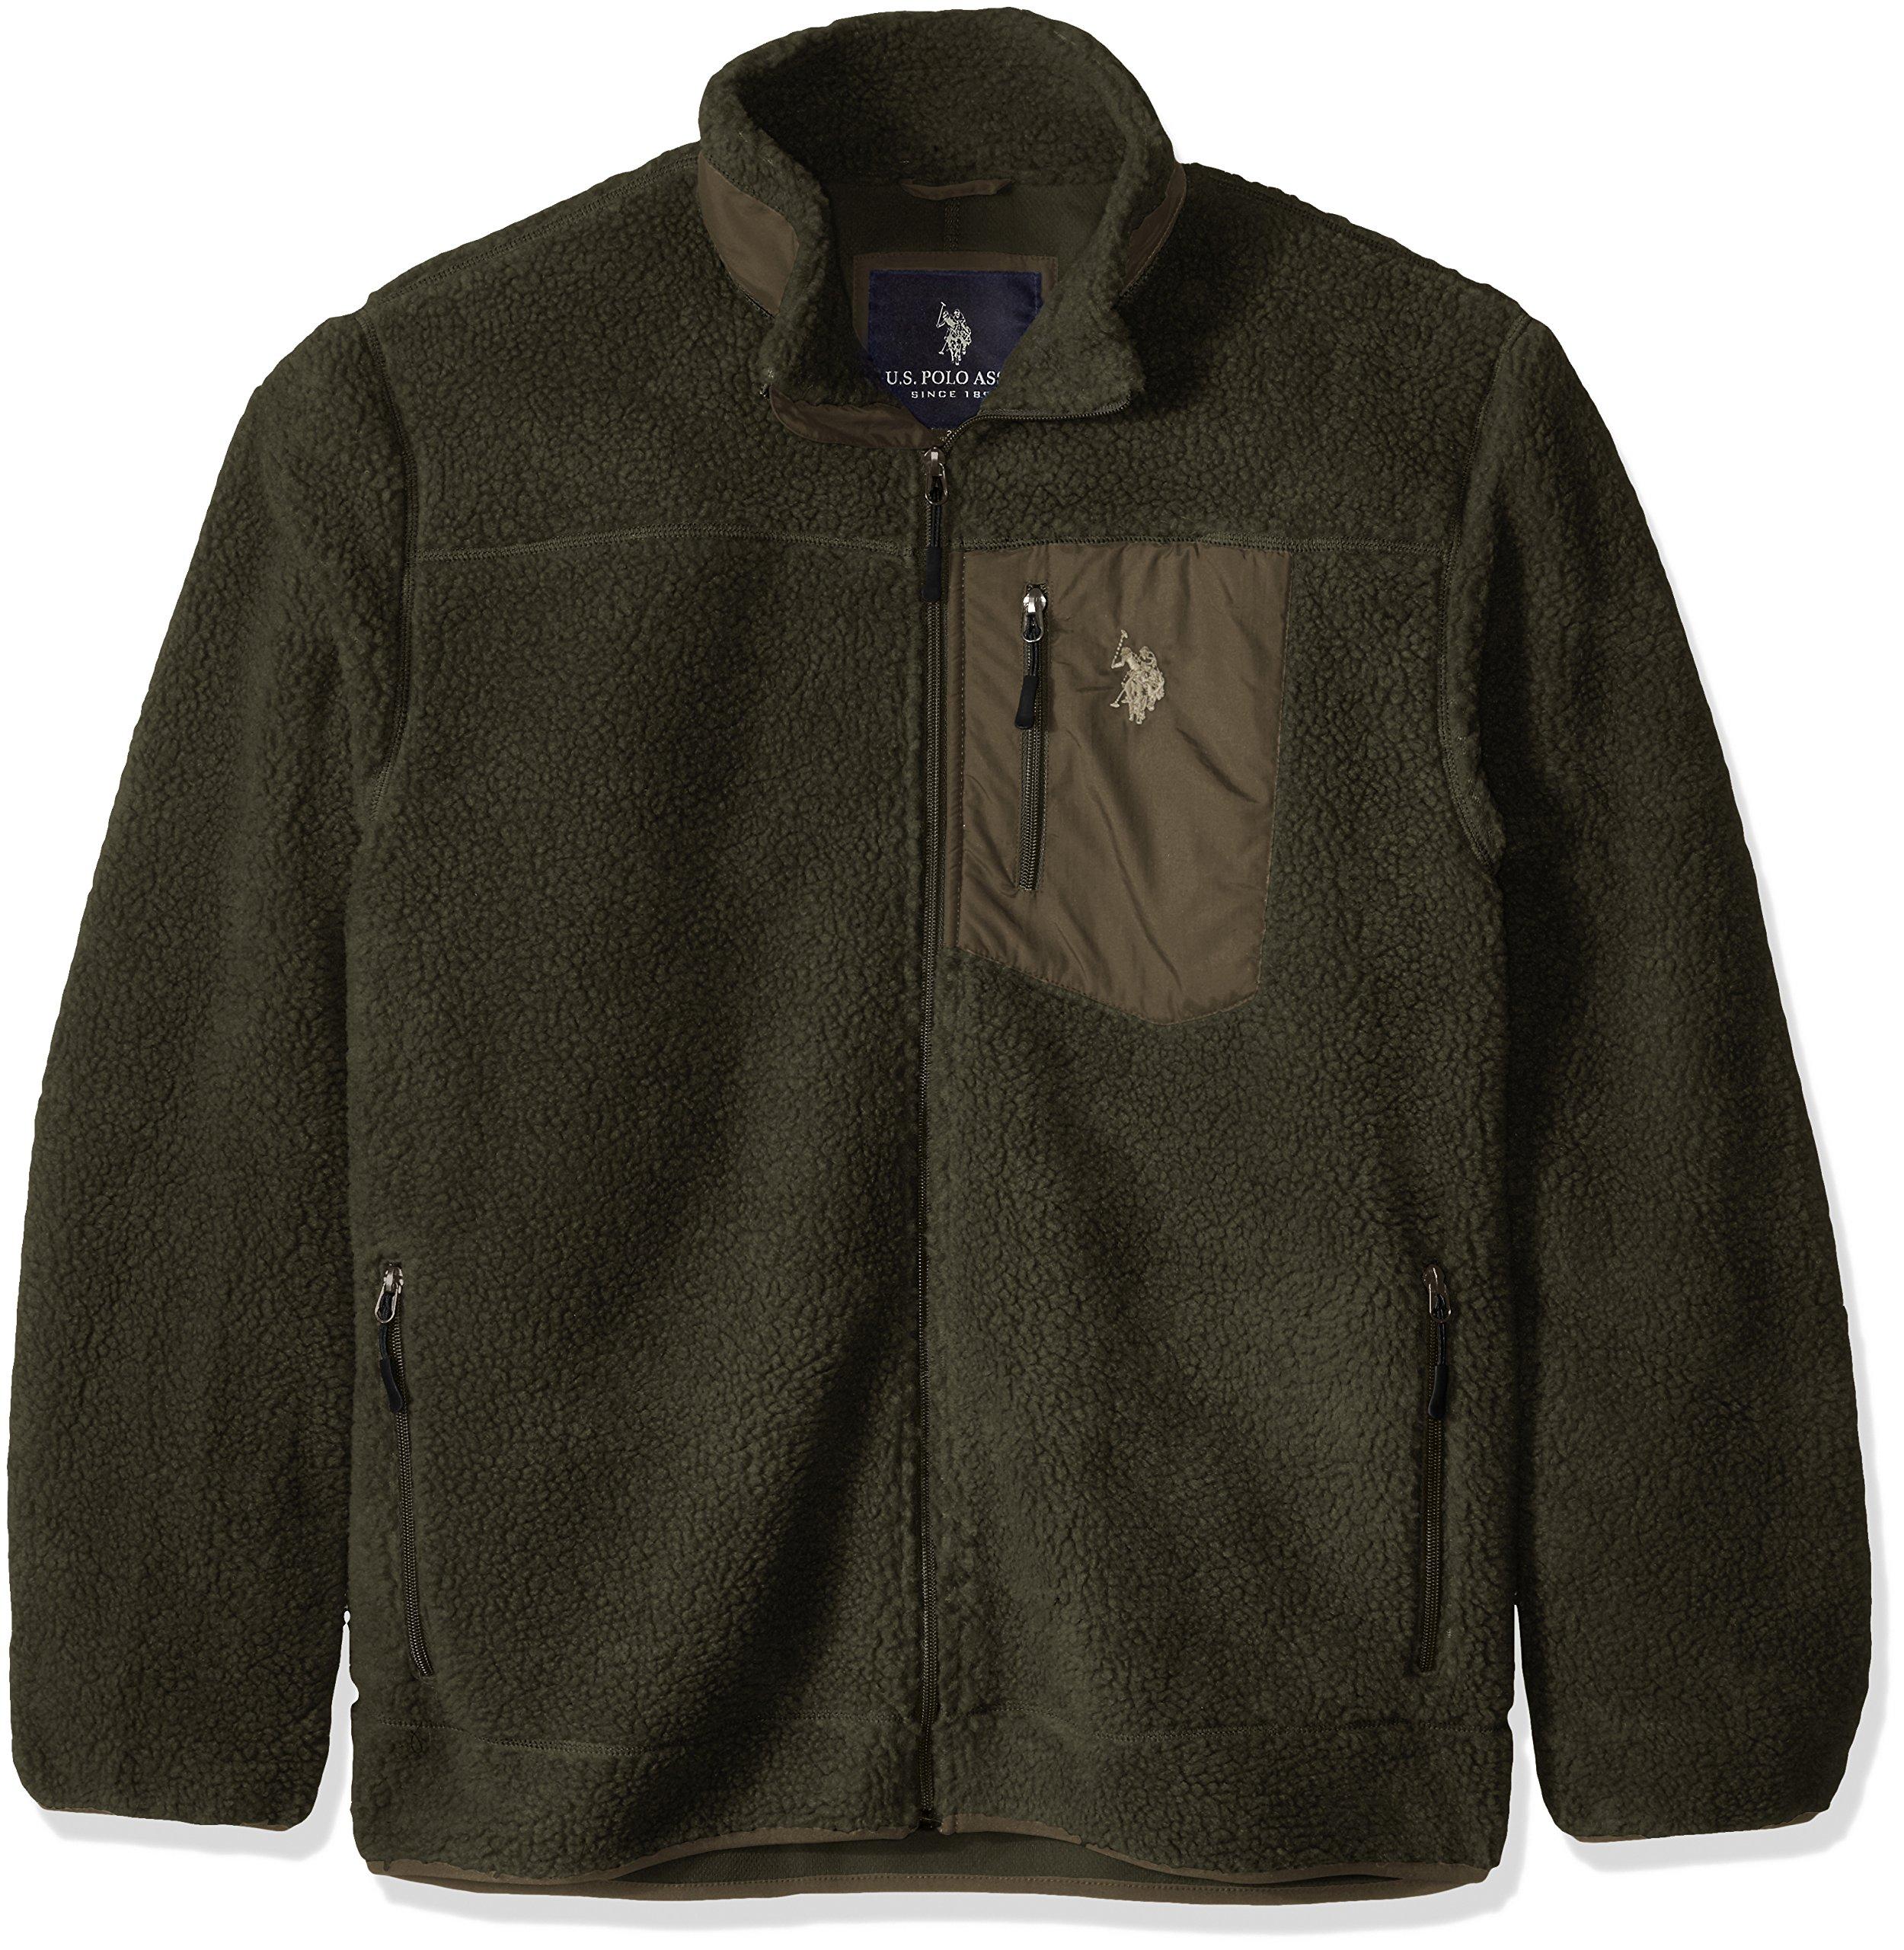 ویکالا · خرید  اصل اورجینال · خرید از آمازون · U.S. Polo Assn. Men's Faux Sherpa Jacket, Forest Night, XX-Large wekala · ویکالا